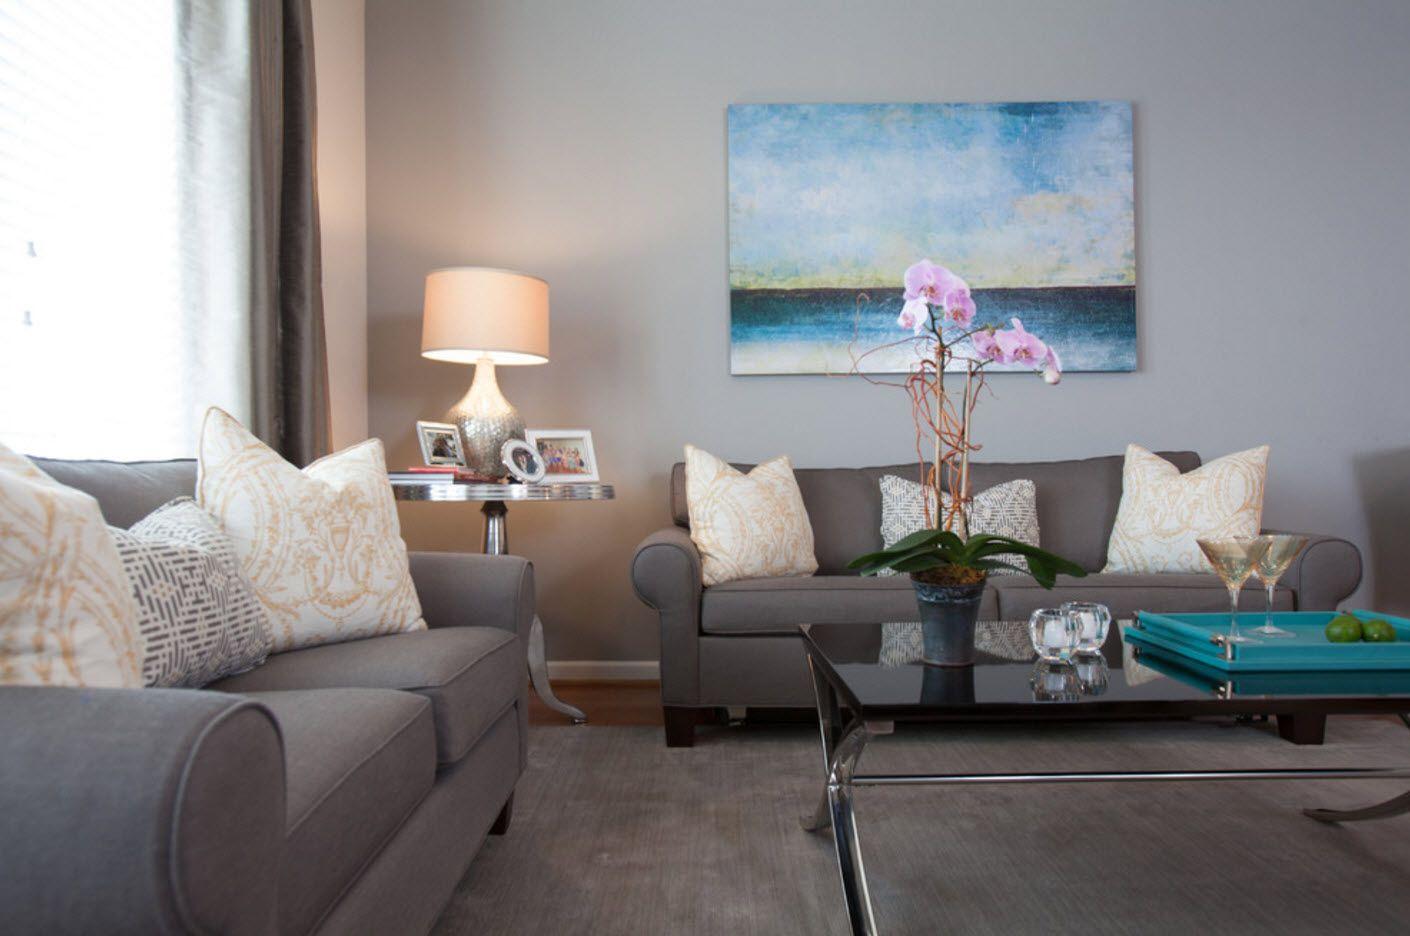 Apartment Interior Design Inspiration Ideas & Trends 2017. Gray classics